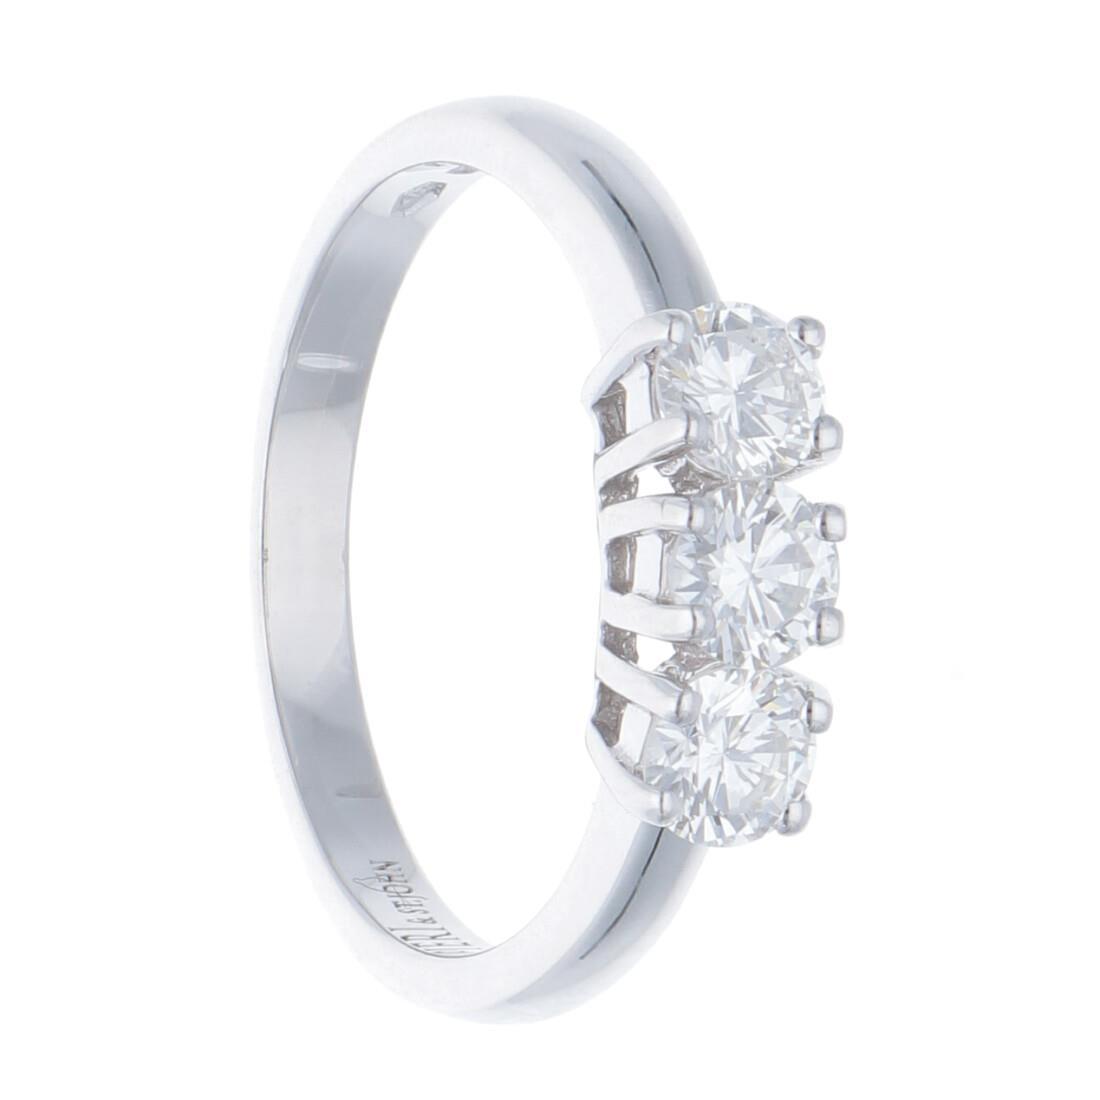 Anello trilogy con diamanti - ALFIERI & ST. JOHN